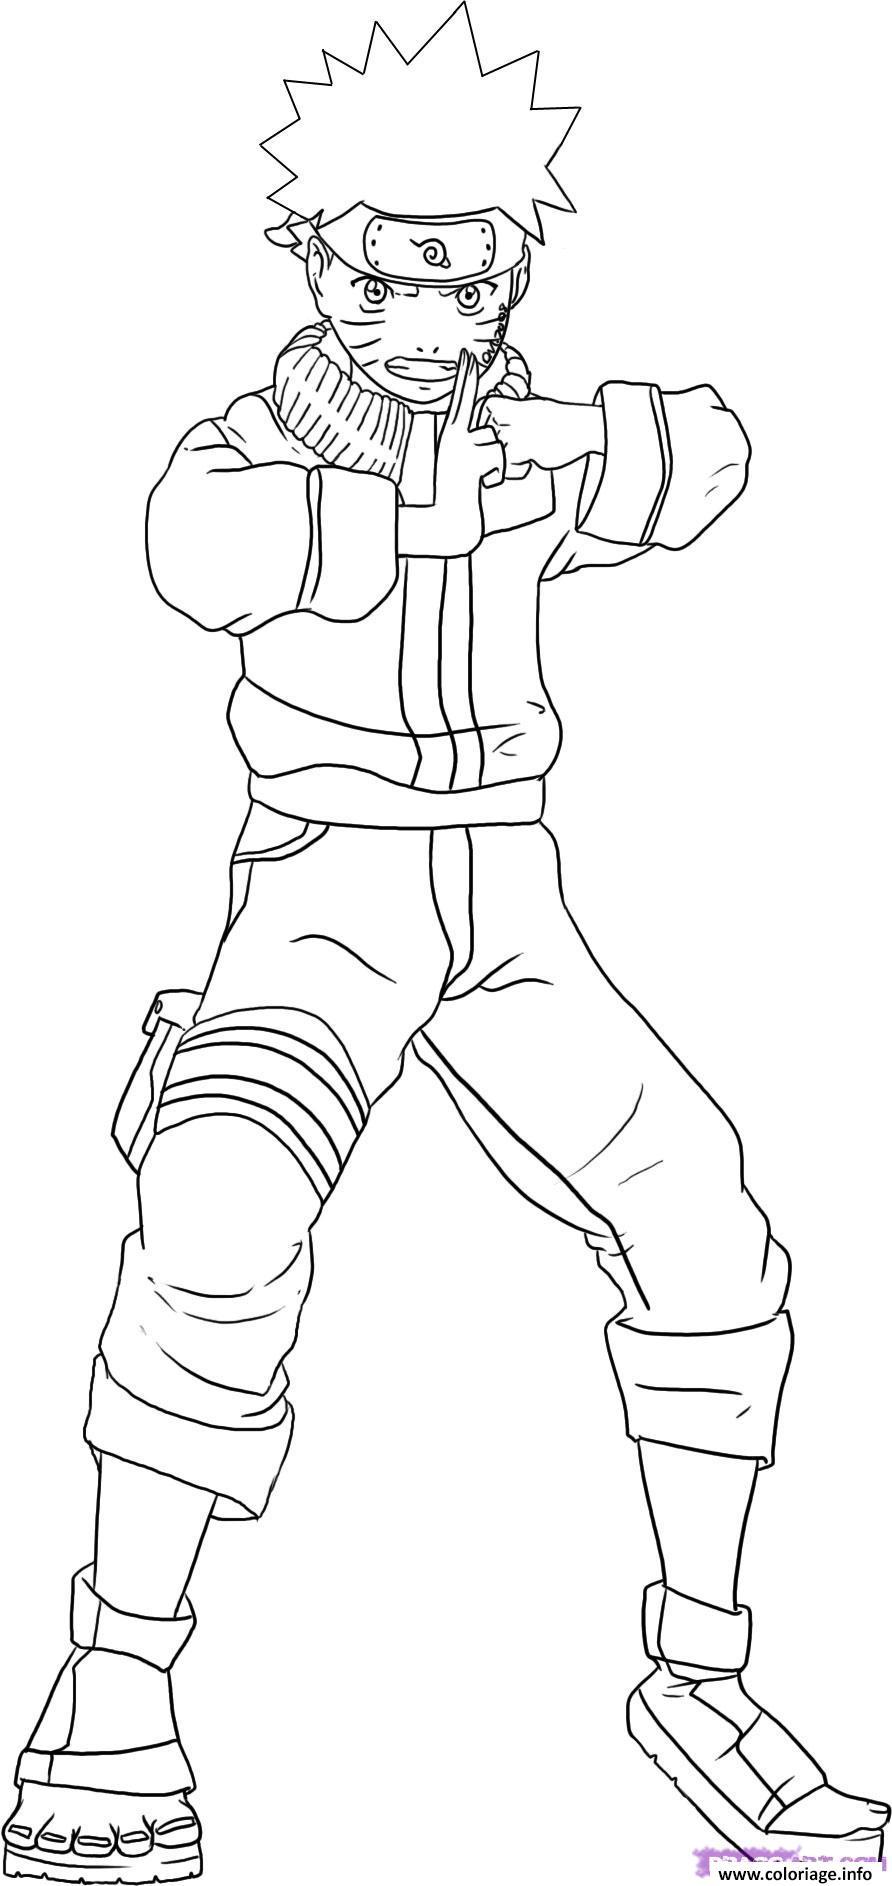 Coloriage Manga Naruto 229 dessin